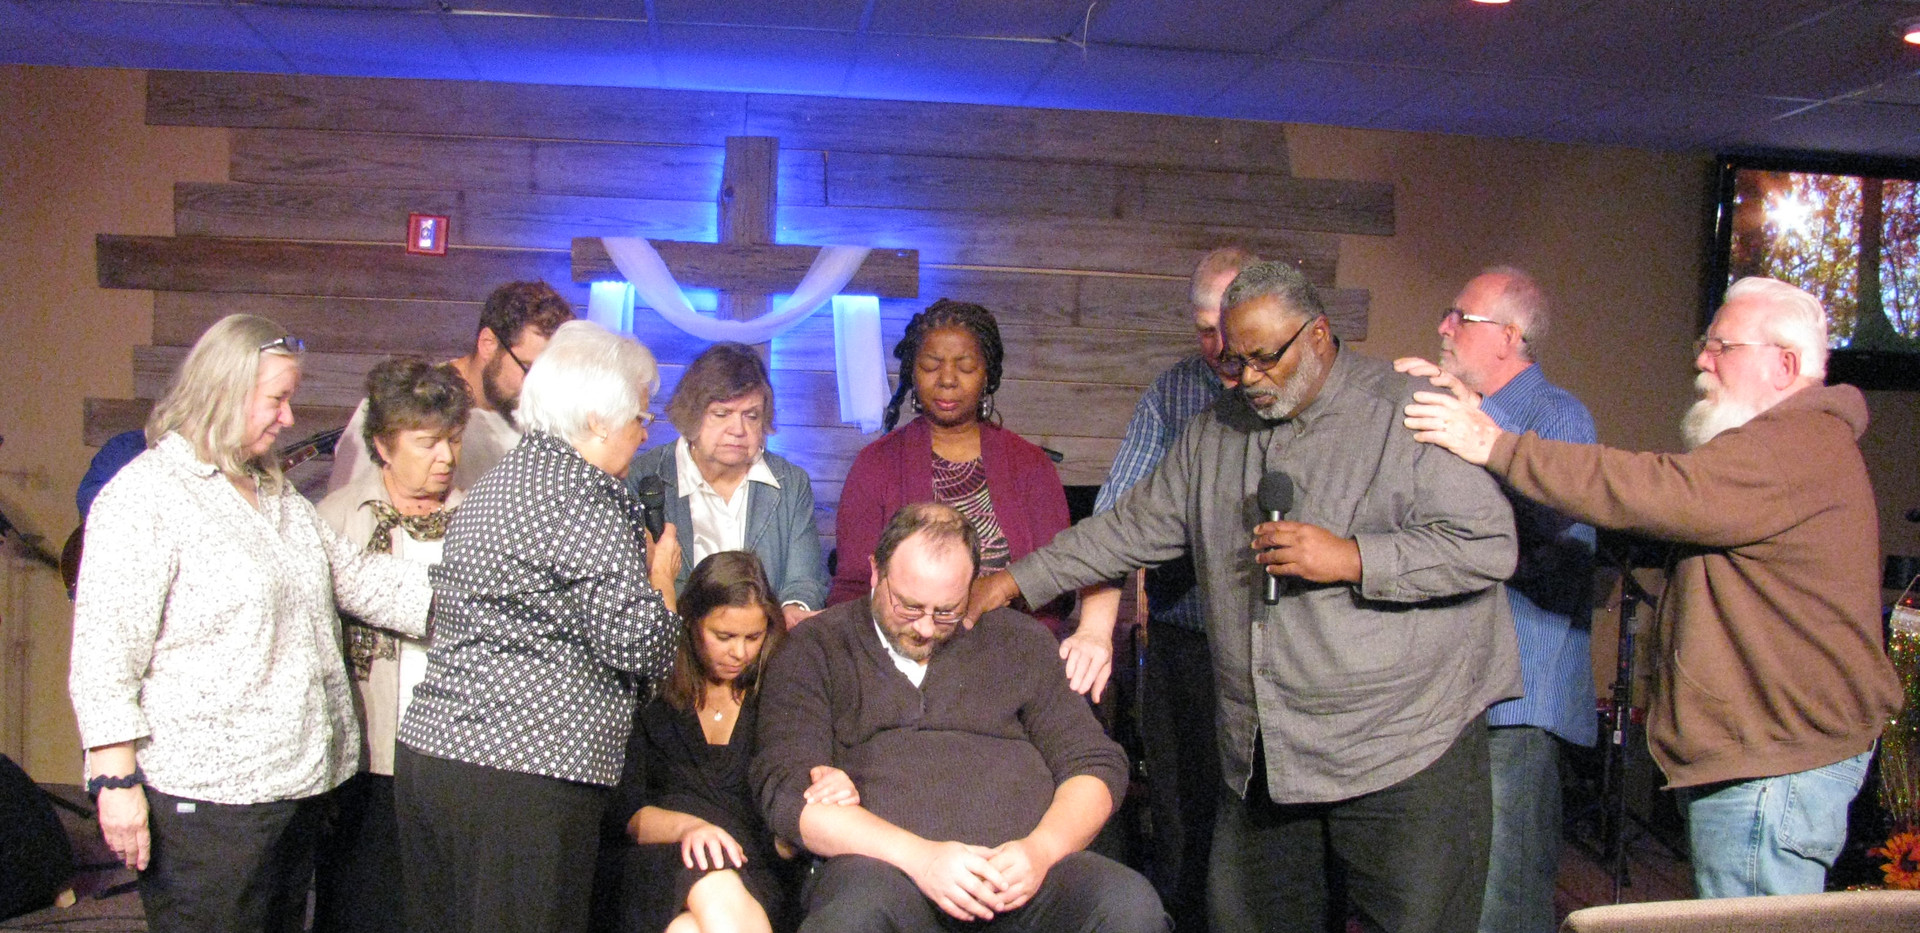 Praying for Pastor Brent and Sarah